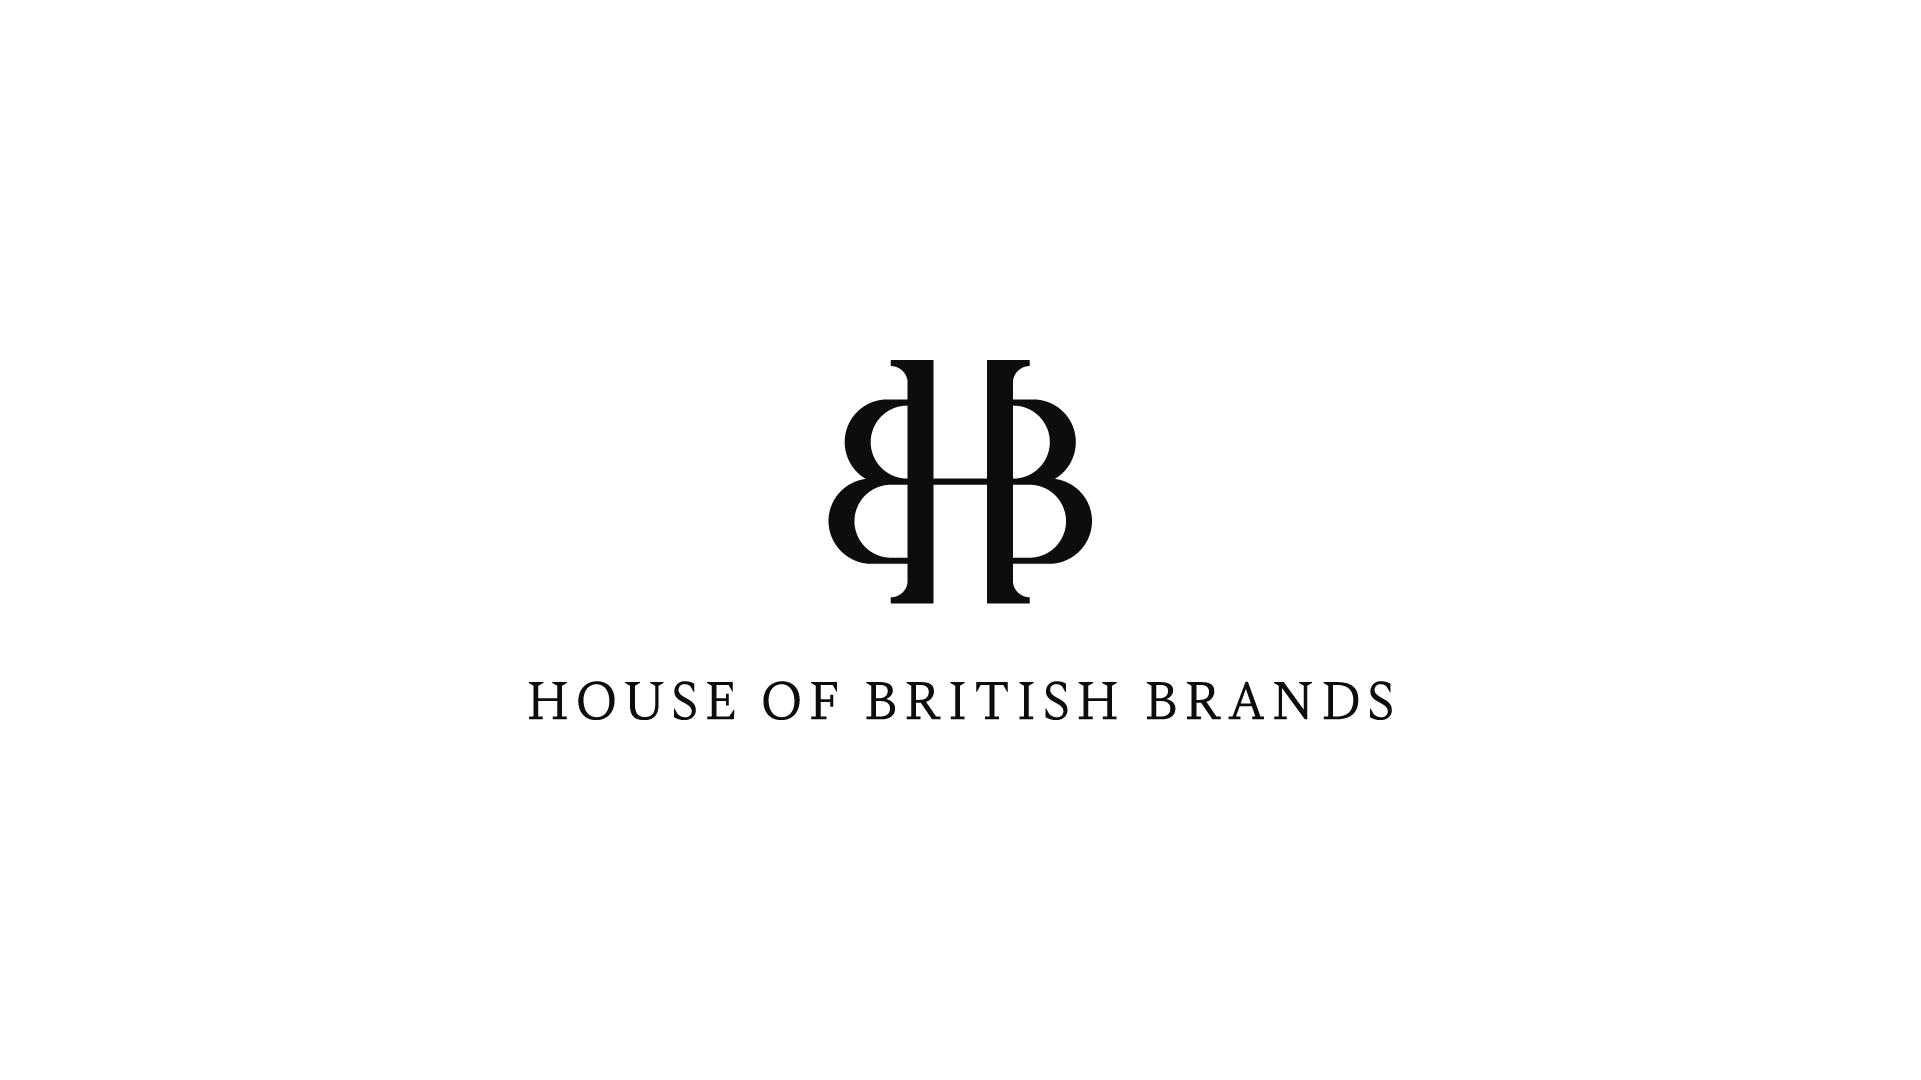 House of British Brands